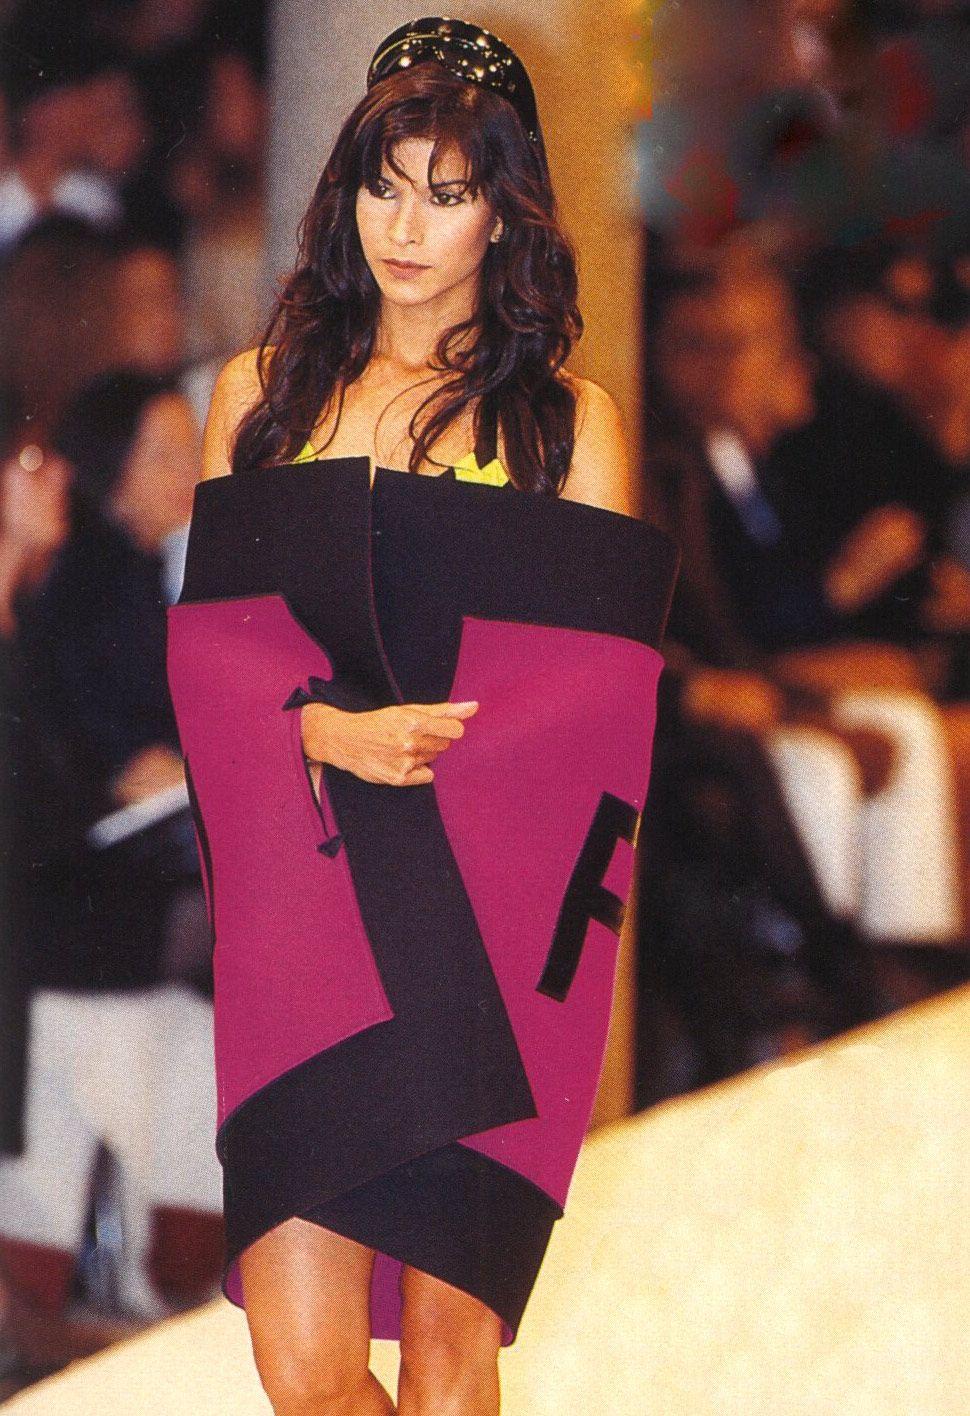 1996 Fendi Furs Fashion Magazine Print Ad: Fendi 1990-2000 In 2019